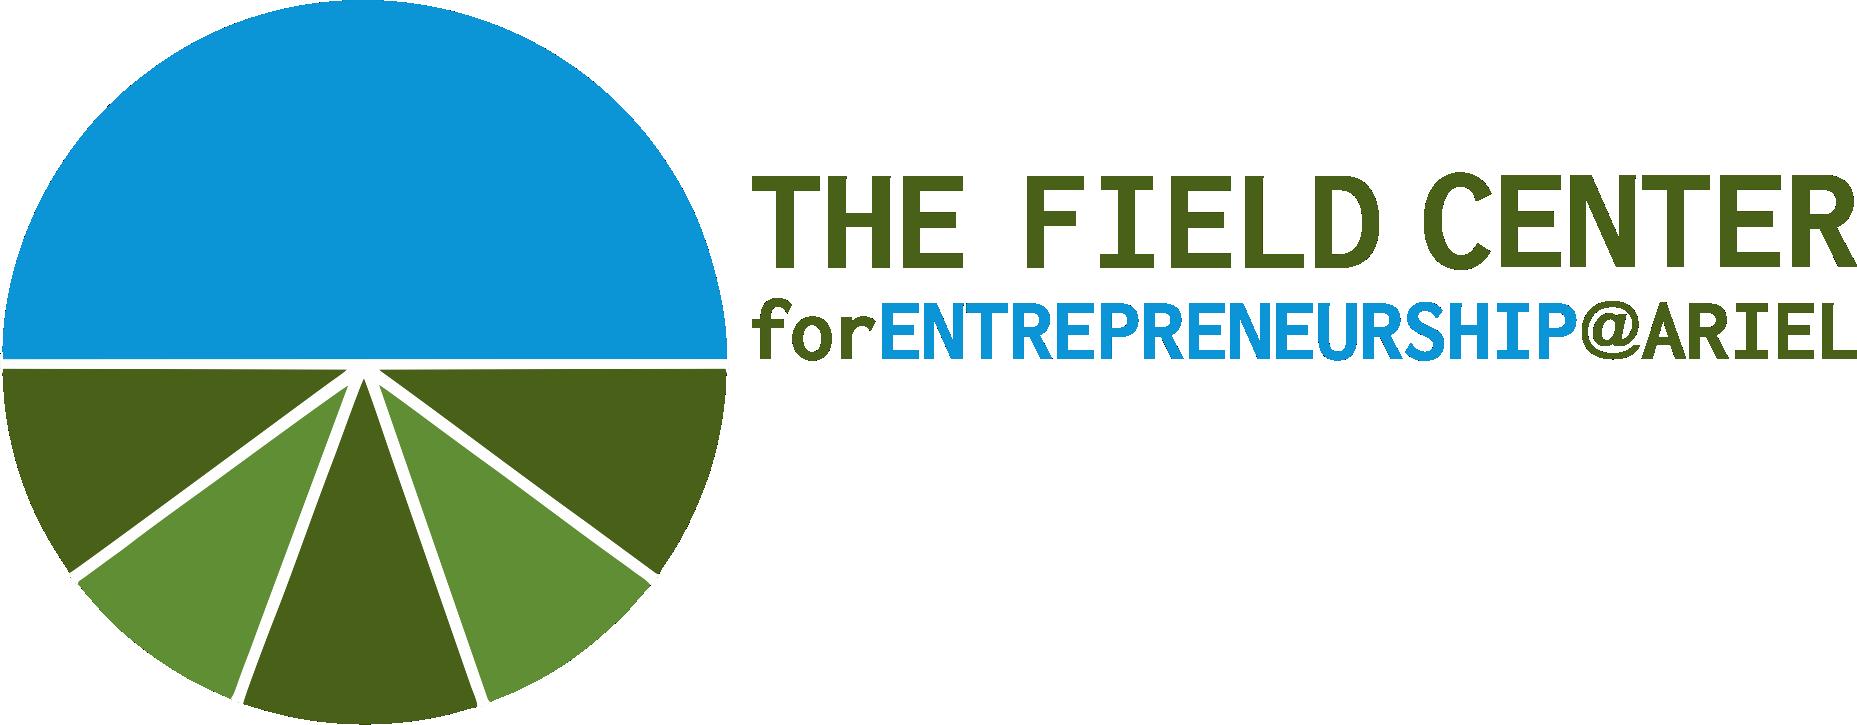 Лого The field center